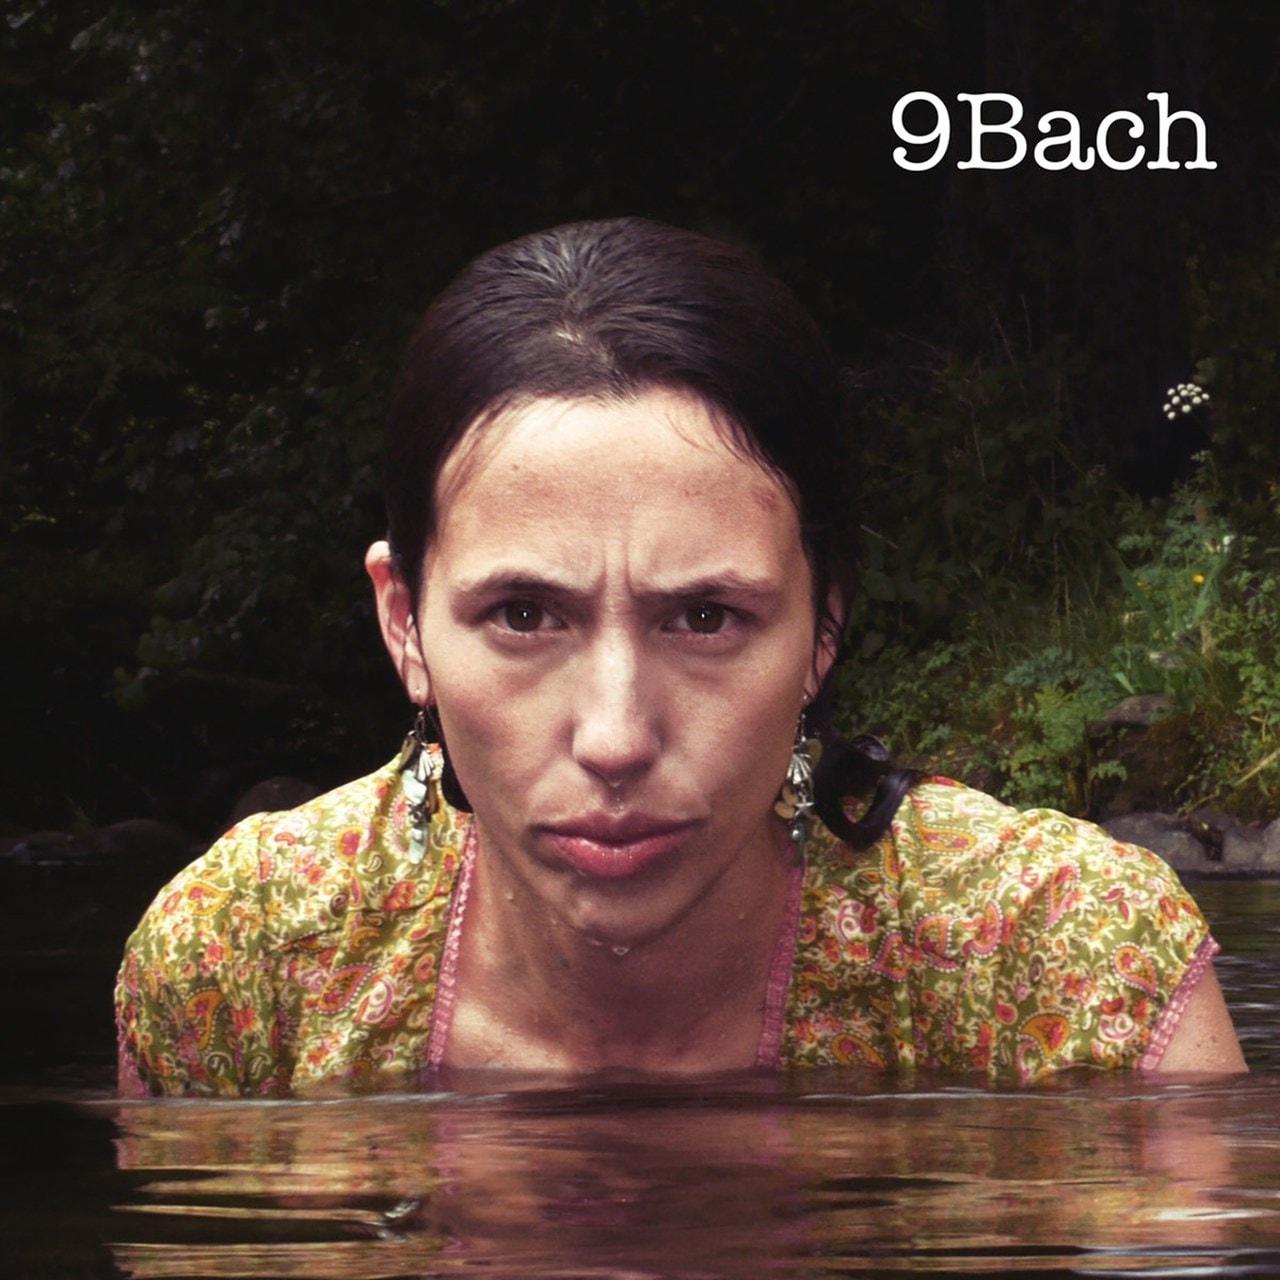 9Bach - 1